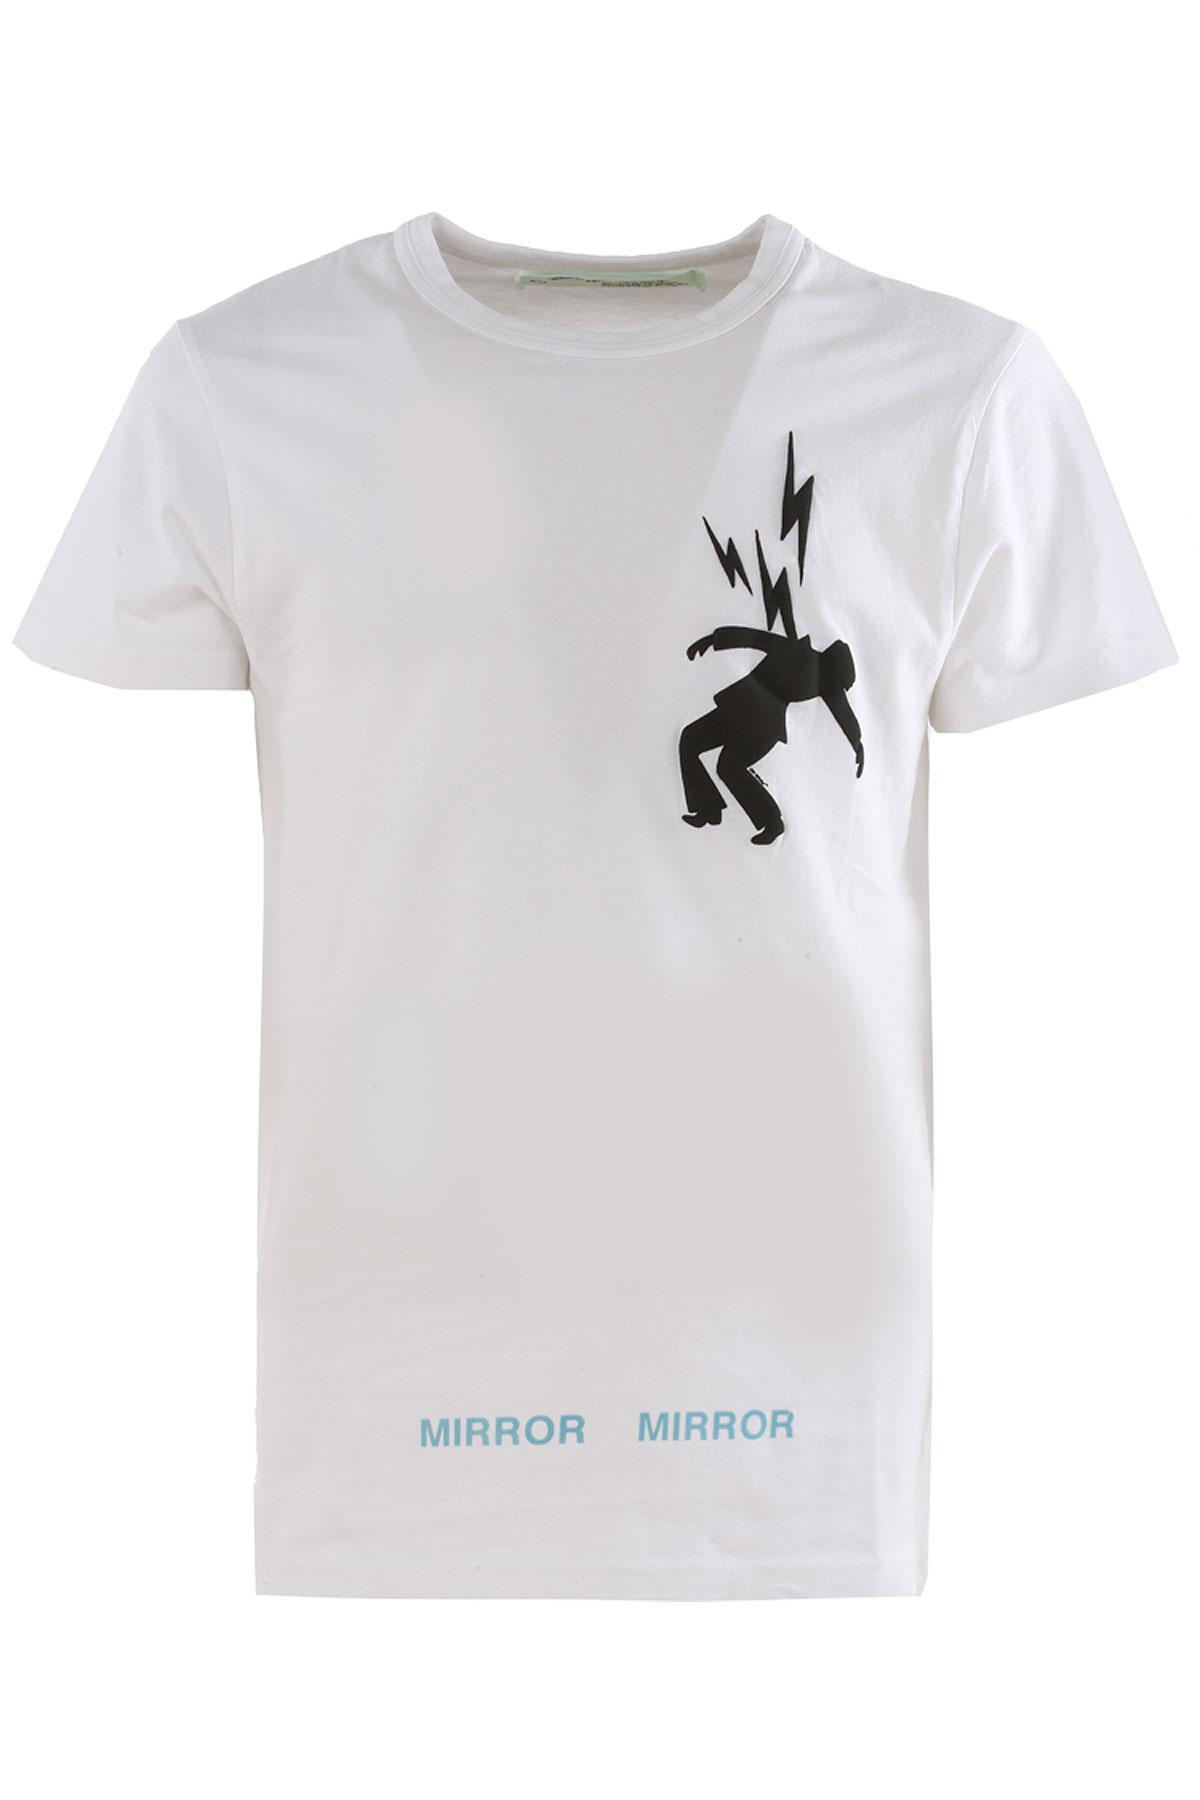 50fa136646 Off White Virgil Abloh T Shirt Sale | Saddha